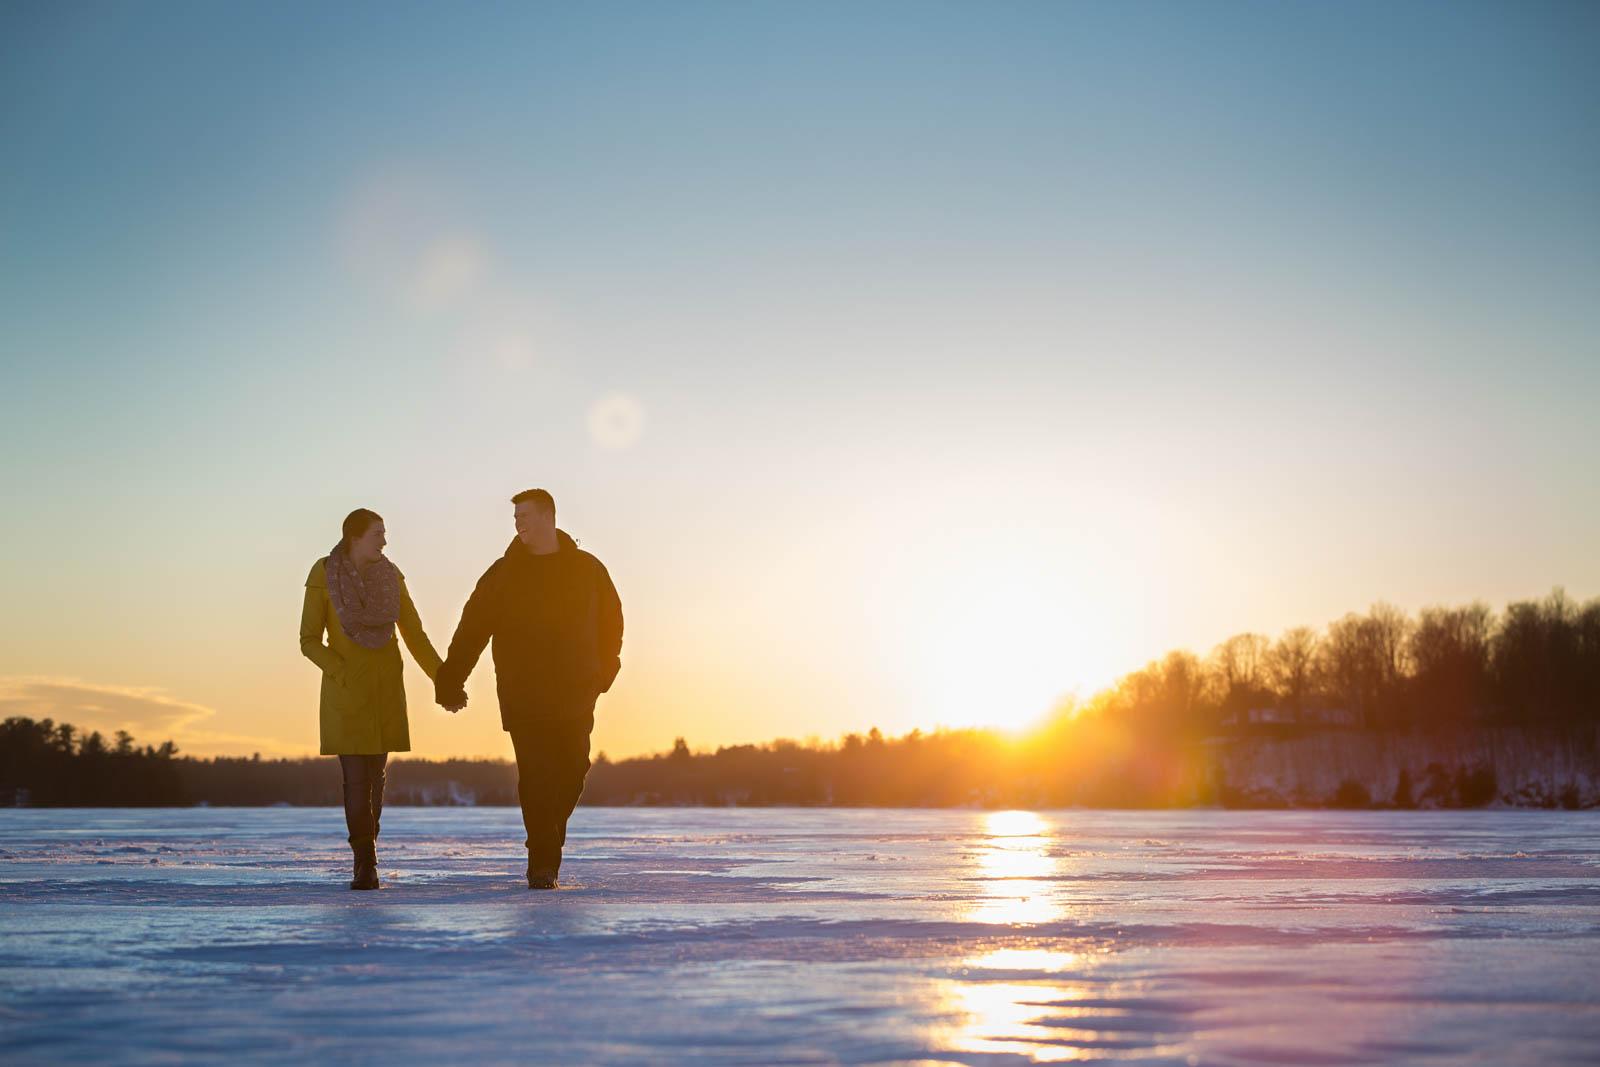 Winter sunset frozen lake engagement session at Perth Rideau Lakes Murphys Point Provincial Park